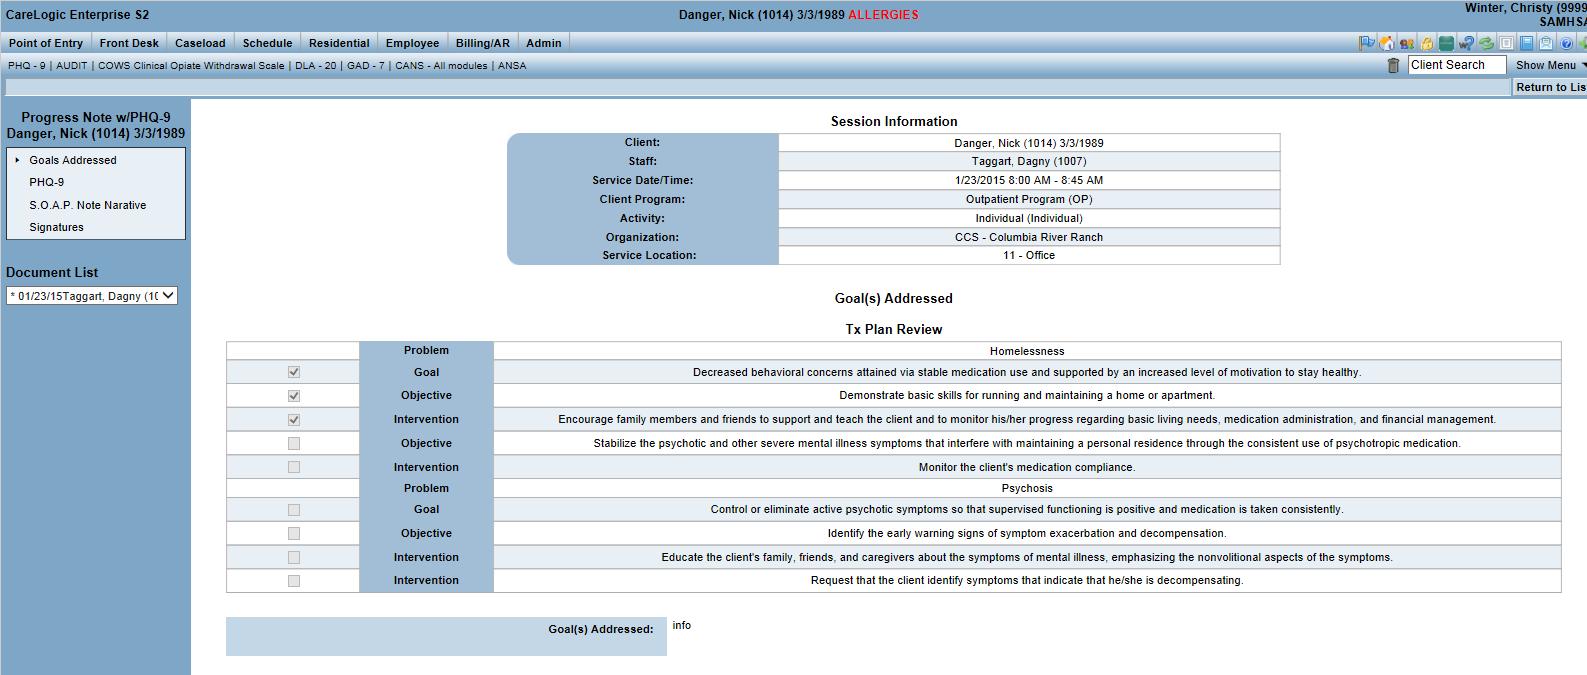 CareLogic Enterprise - Qualifacts progress notes